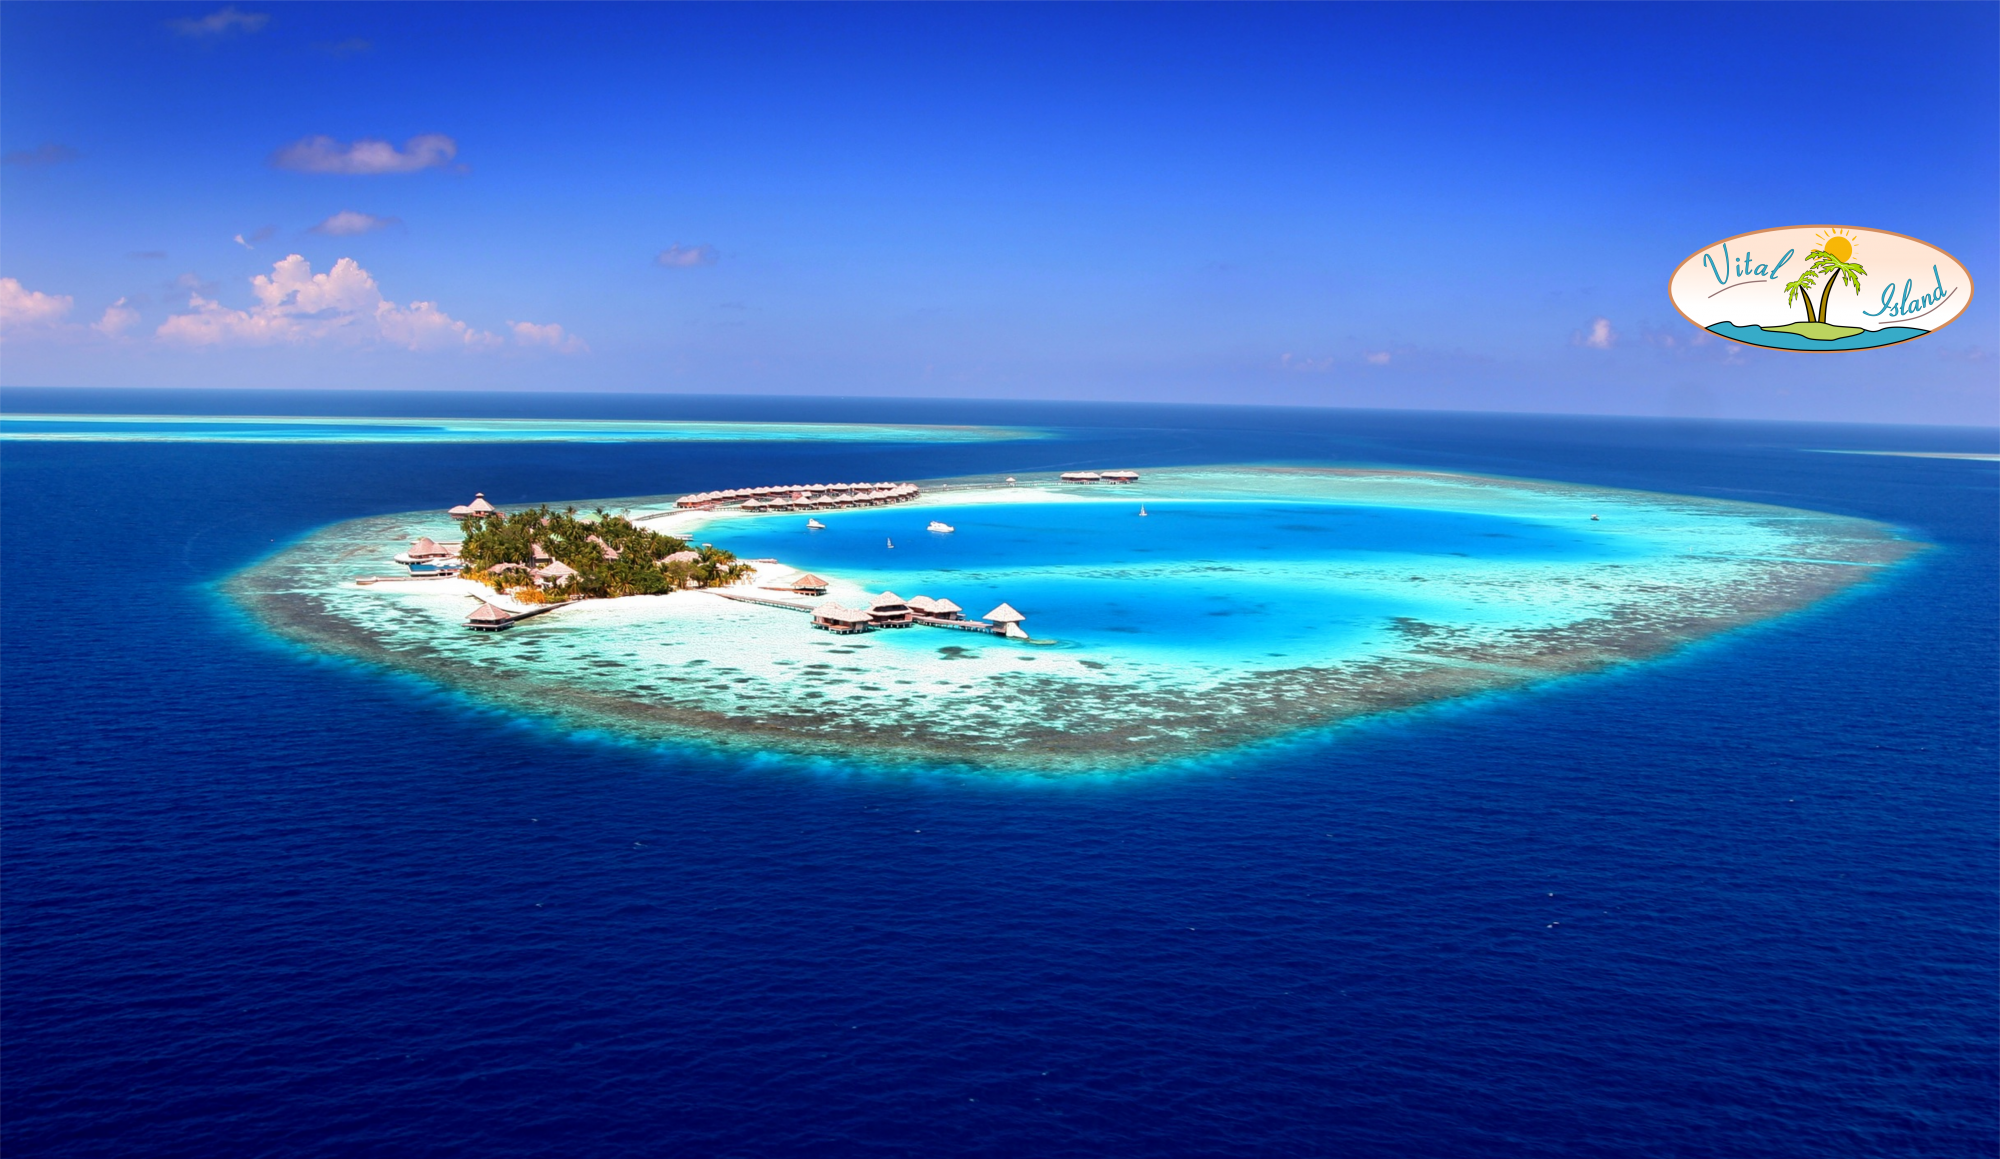 Vital-Island - the island of vitality